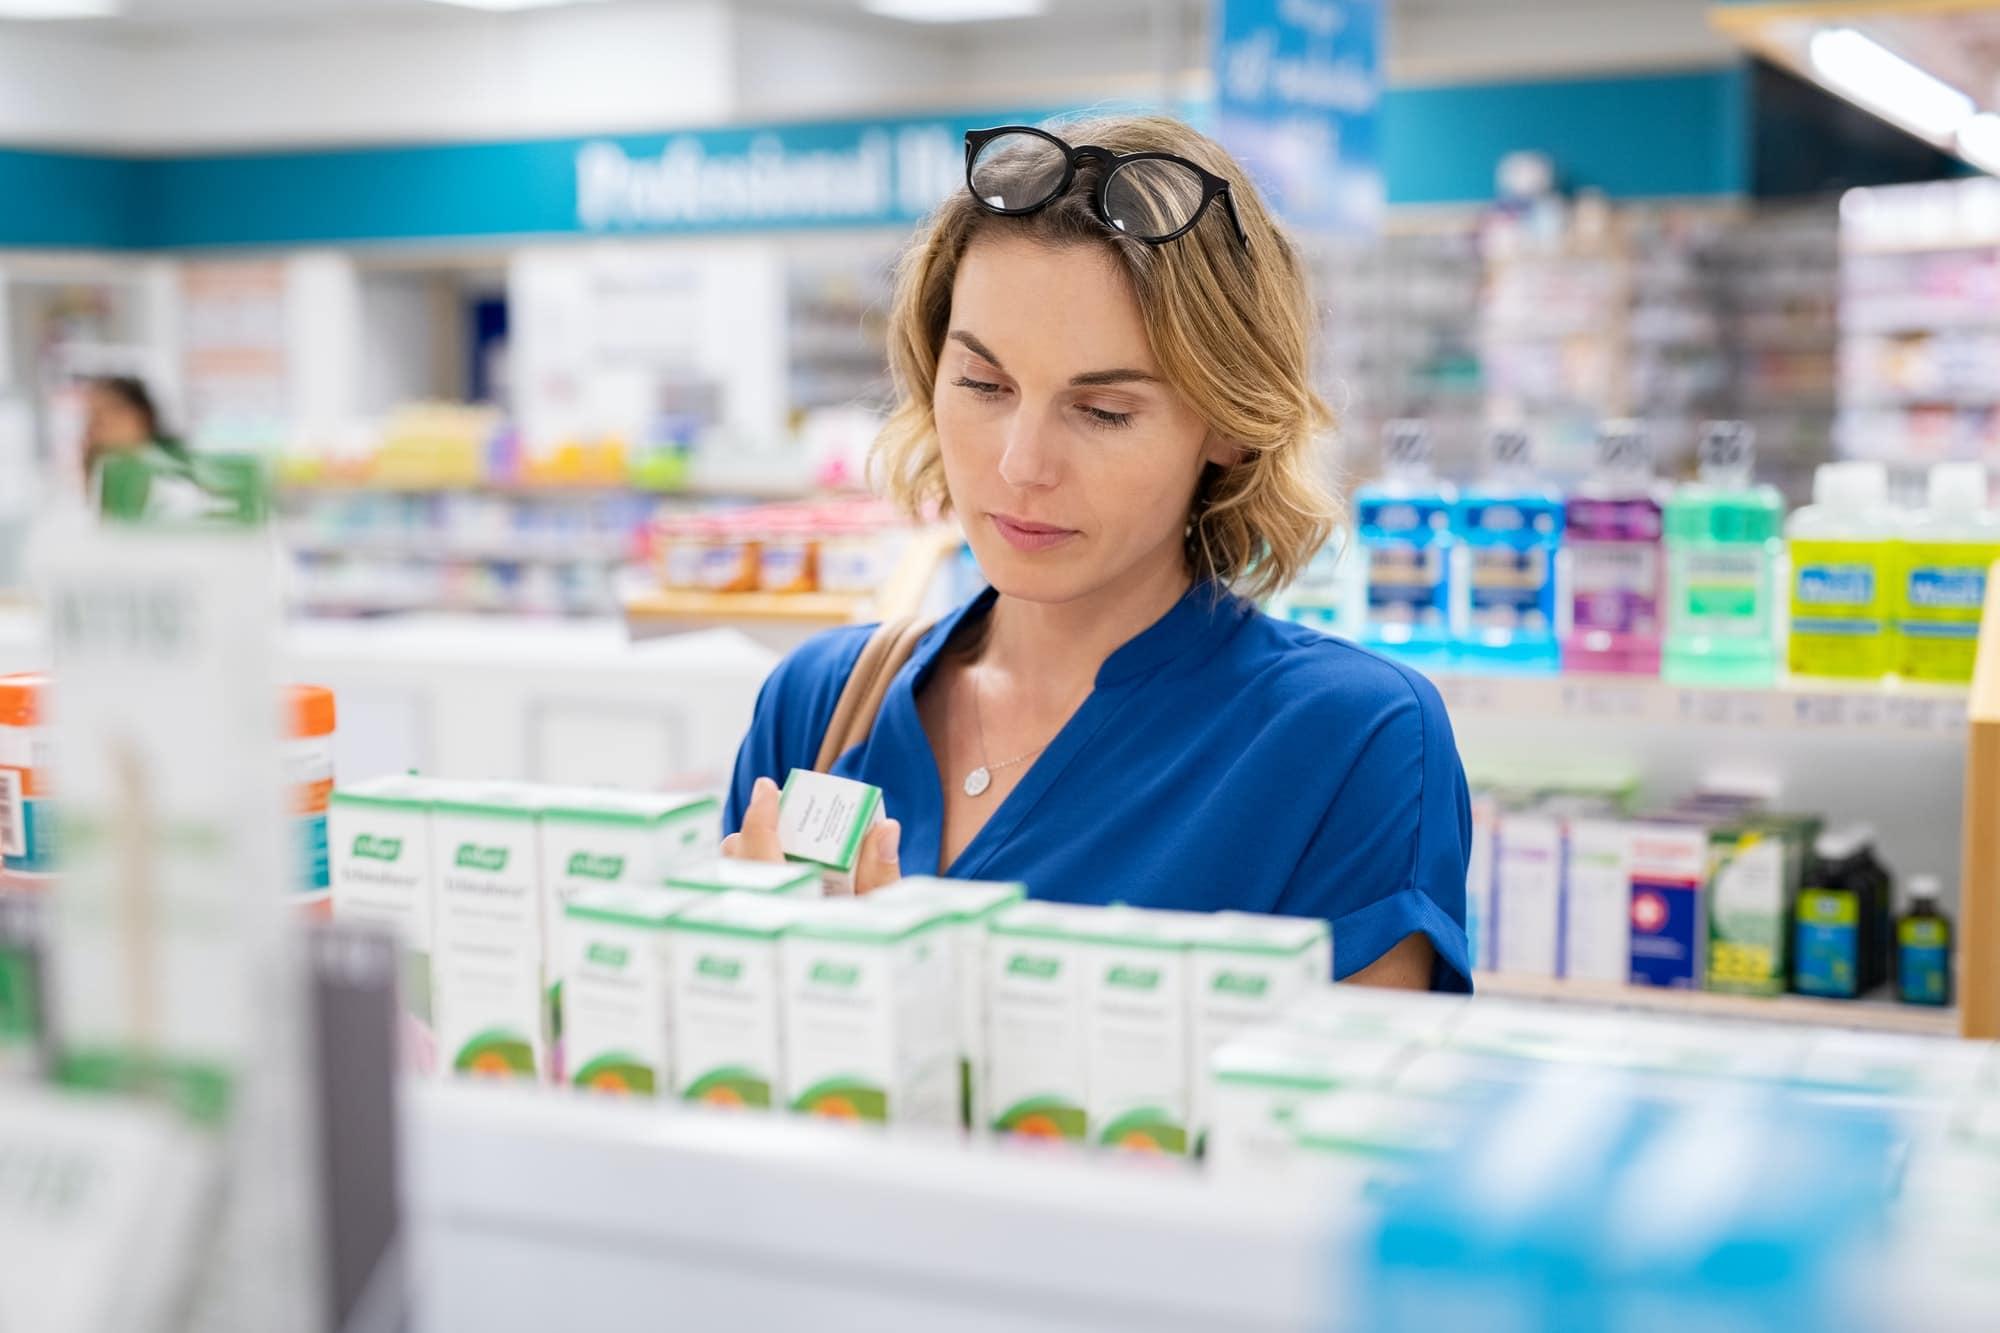 Woman choosing product in pharmacy